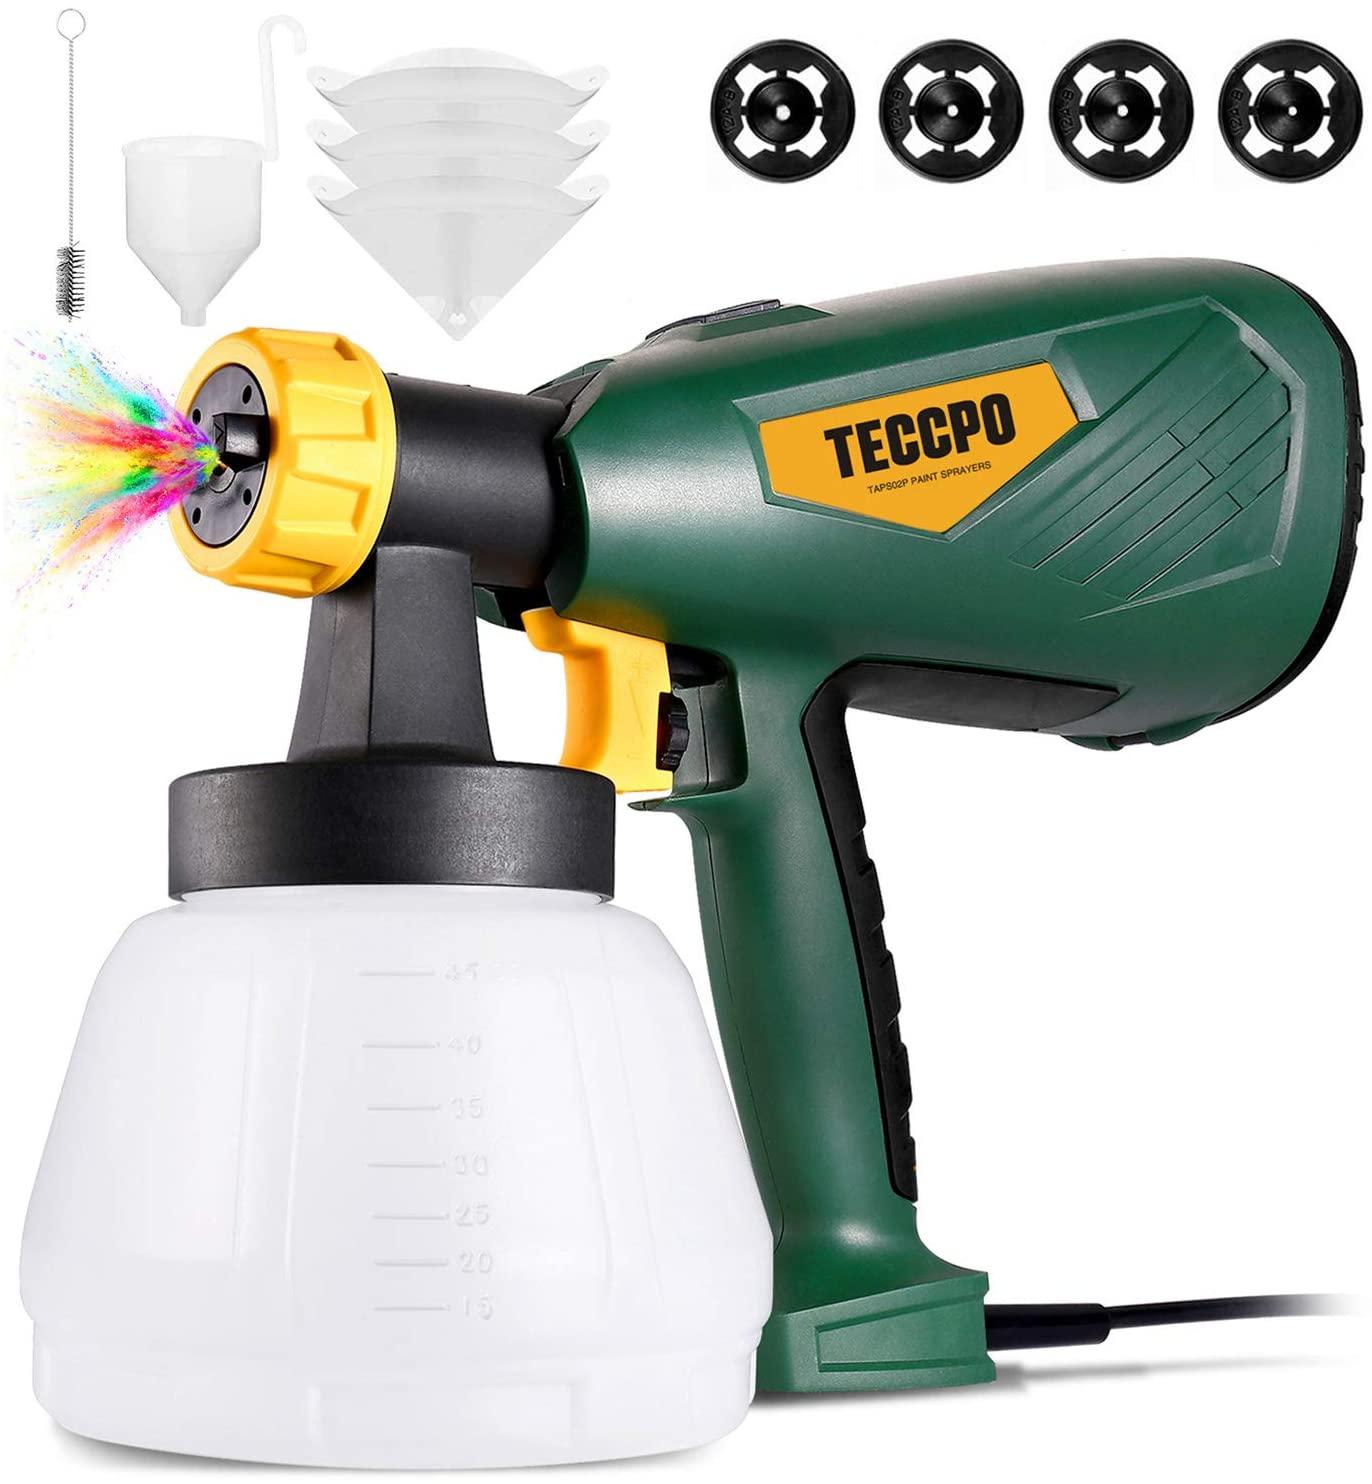 TECCPO 600 Watts Paint Sprayer, Best HVLP Electric Spray Gun